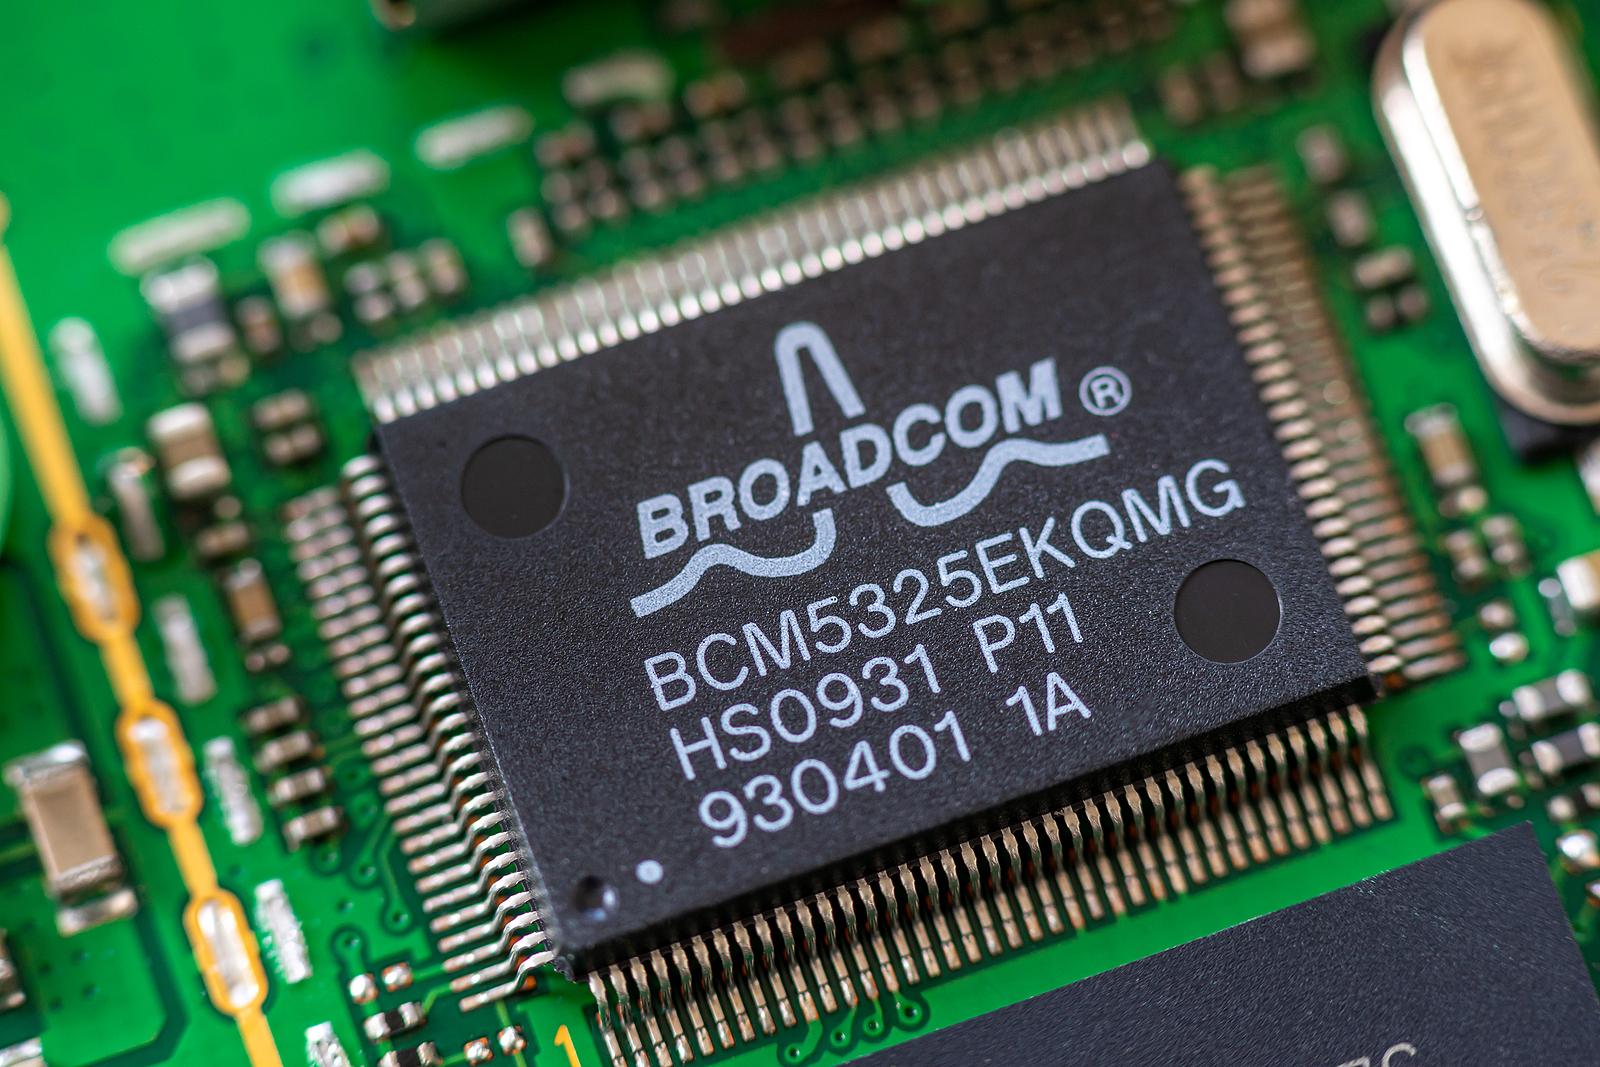 Broadcom stock, AVGO stock, Semiconductor stocks